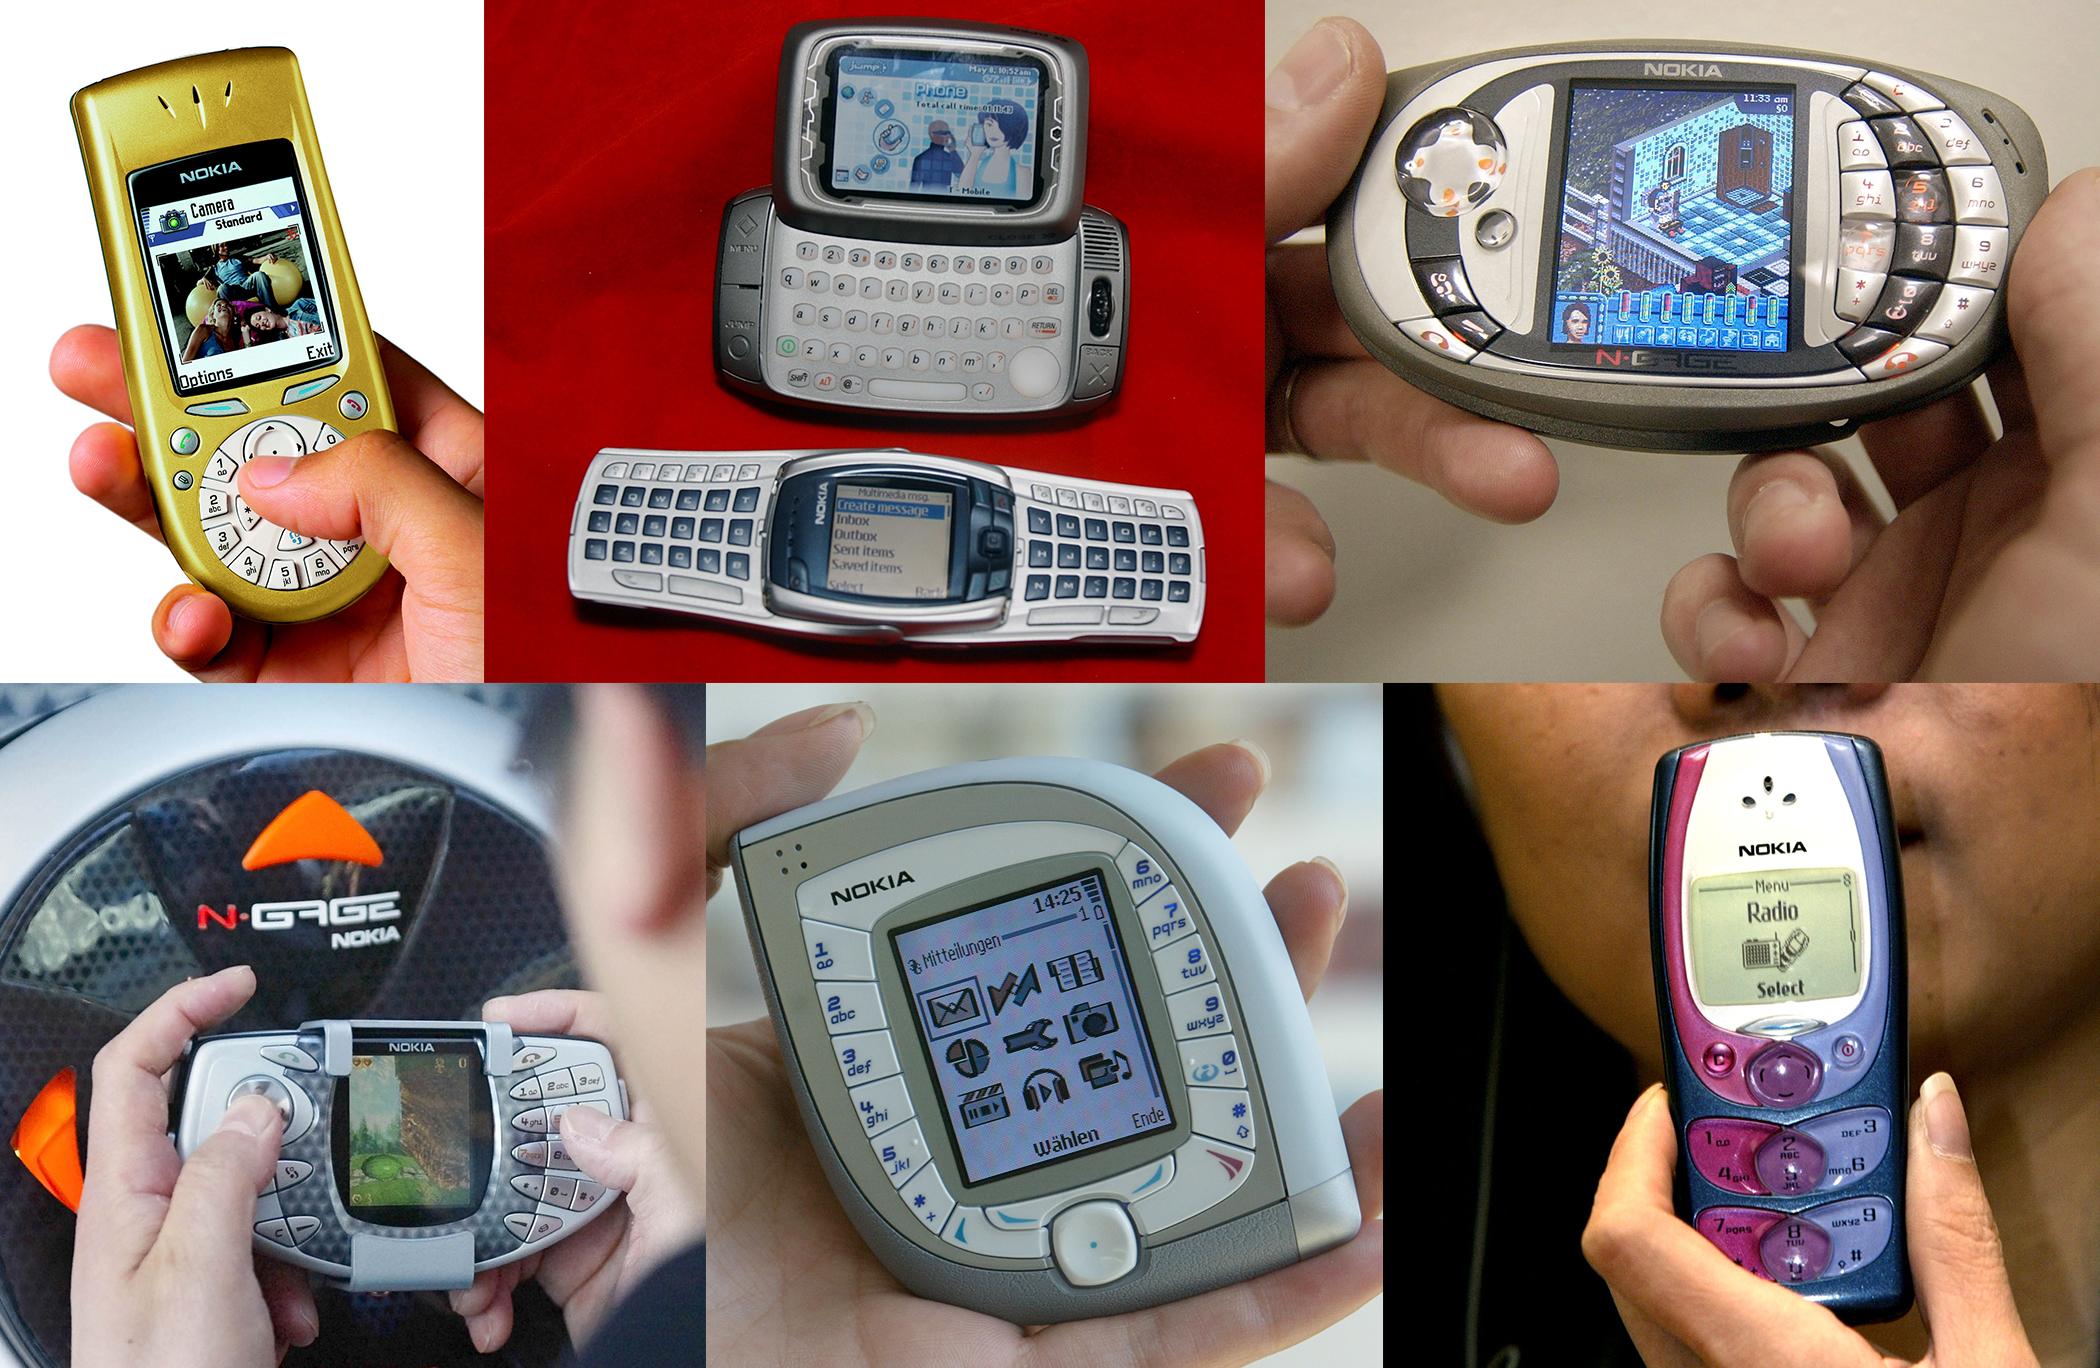 nokia-2000s-phones